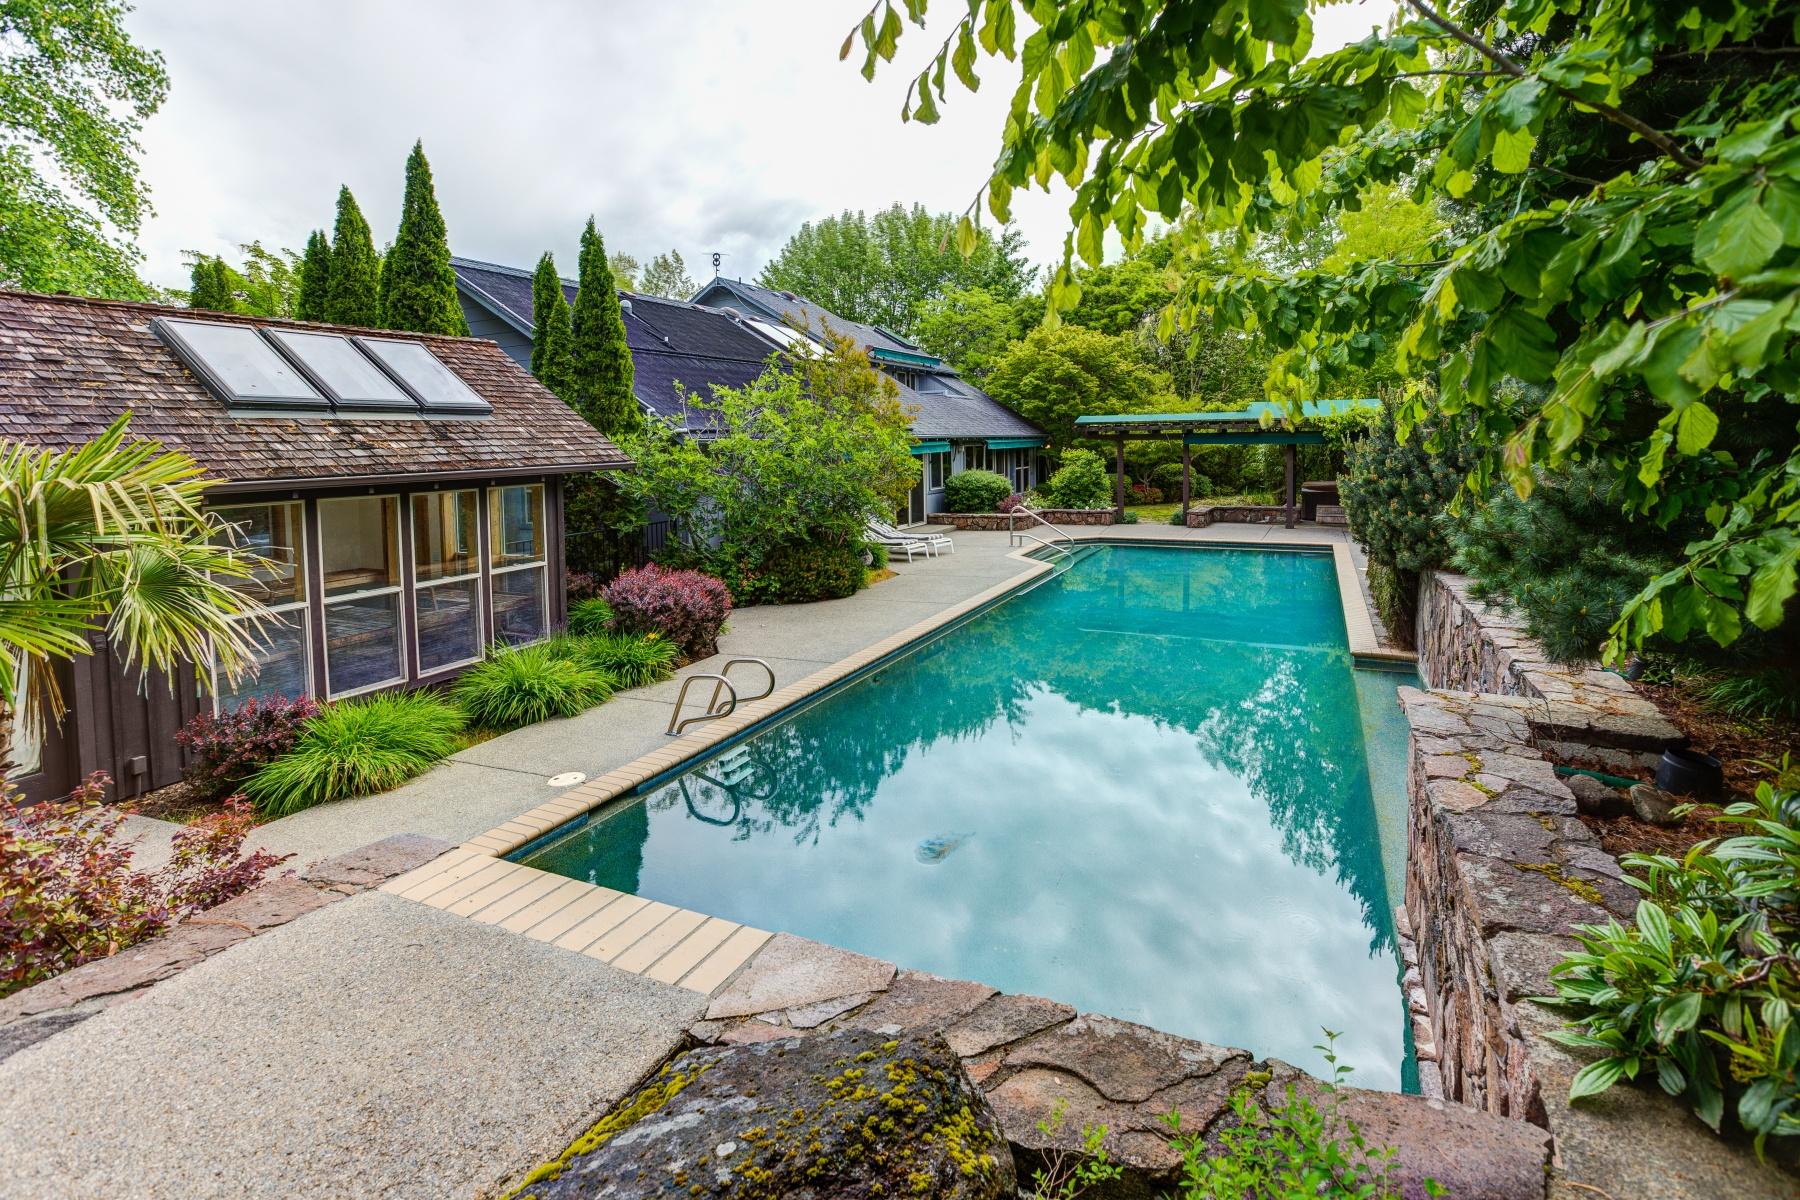 Single Family Home for Sale at 1365 Tolman Creek 1365 Tolman Crk Ashland, Oregon 97520 United States